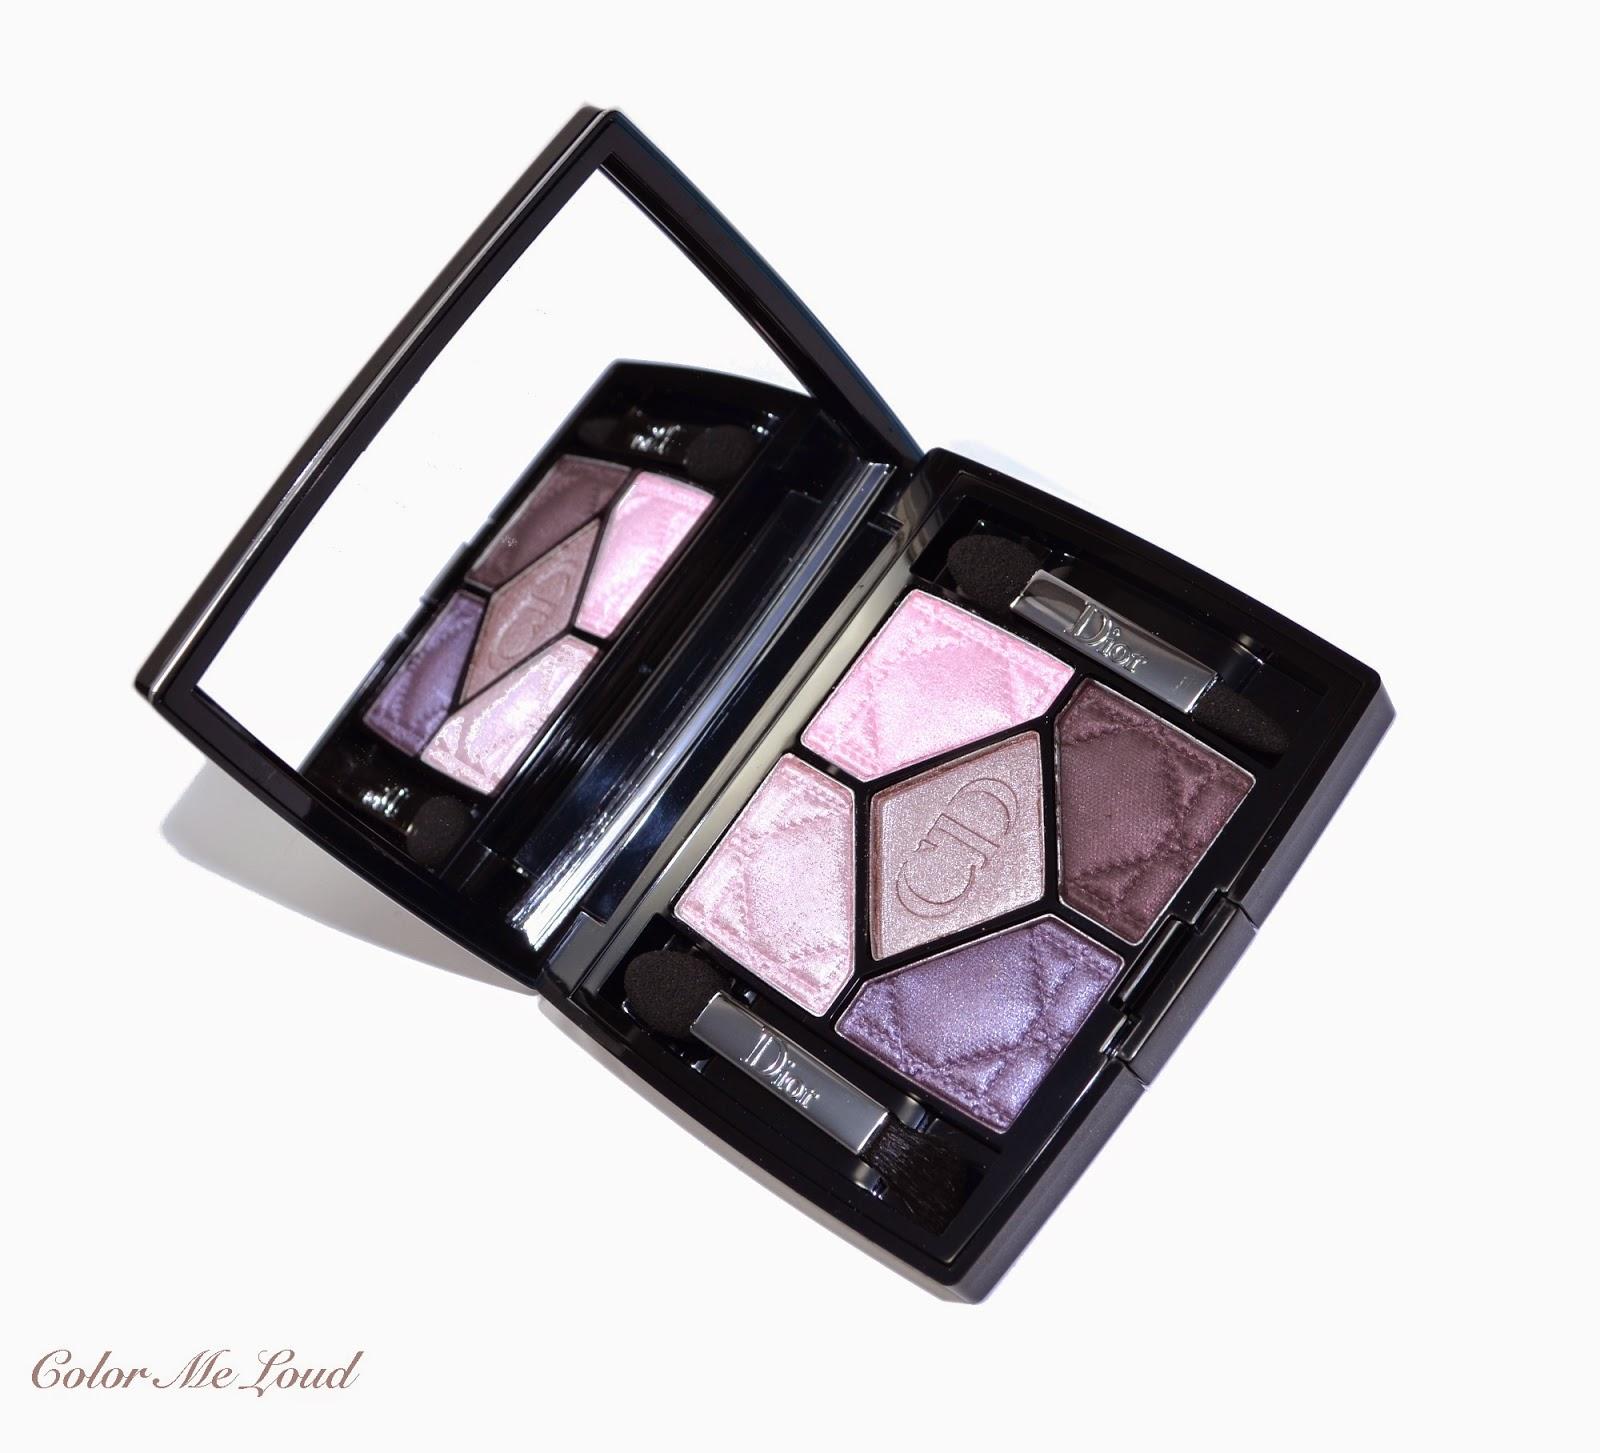 21589d2b0382 Dior 5 Couleurs Eye Shadow Palette  156 Femme-Fleur, Swatch, Review ...